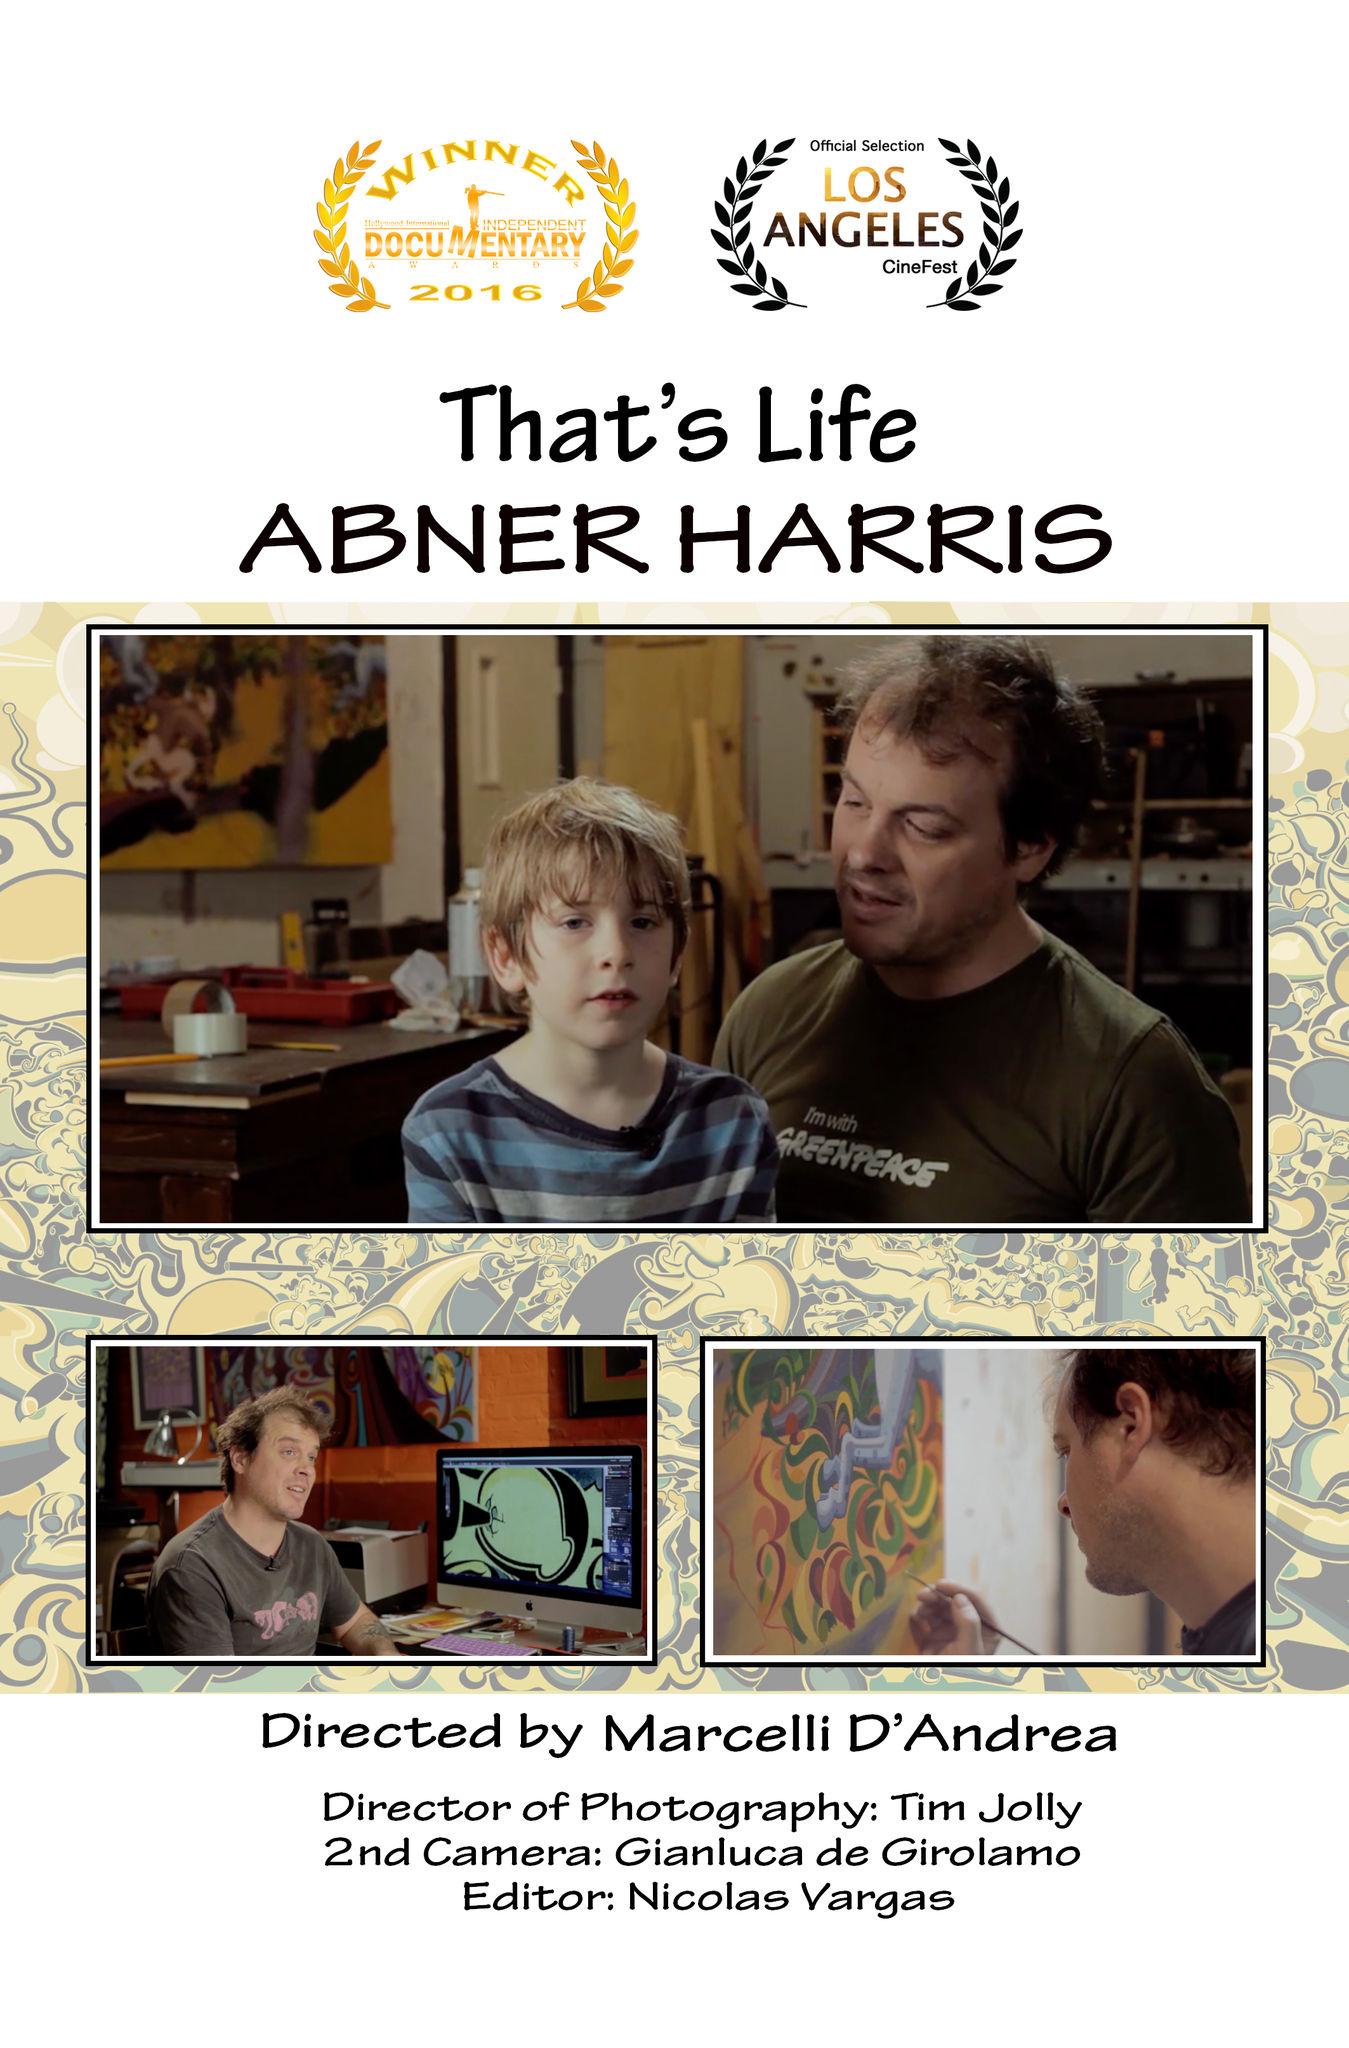 That's Life - Abner Harris